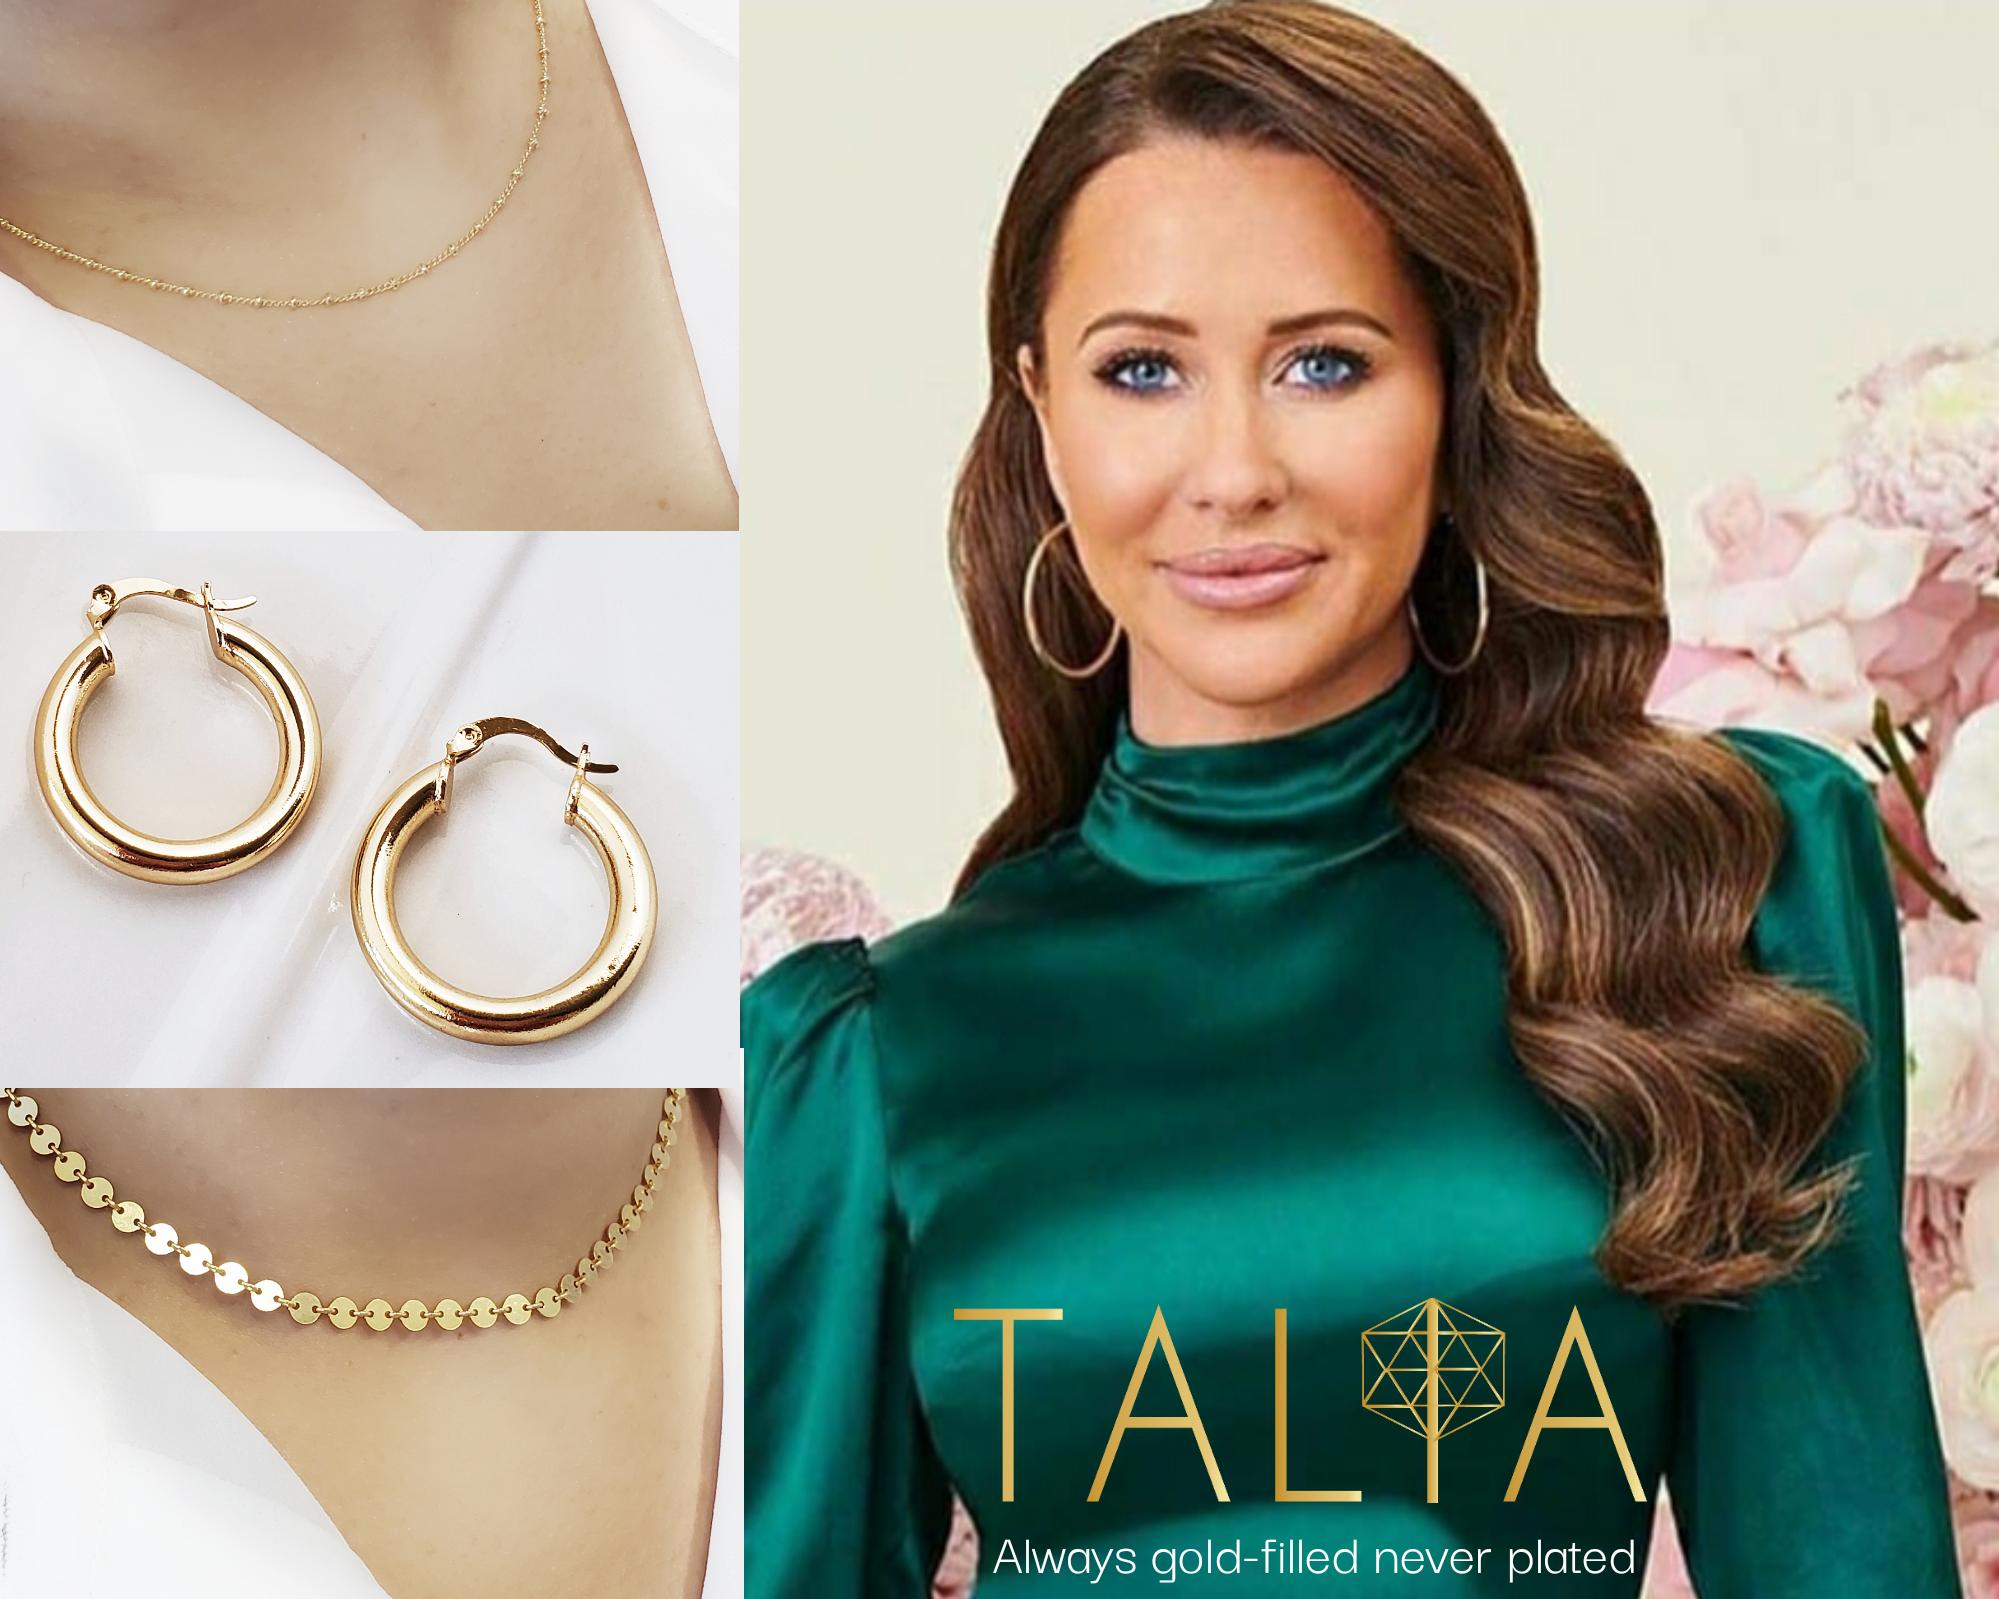 Accessories by Talia